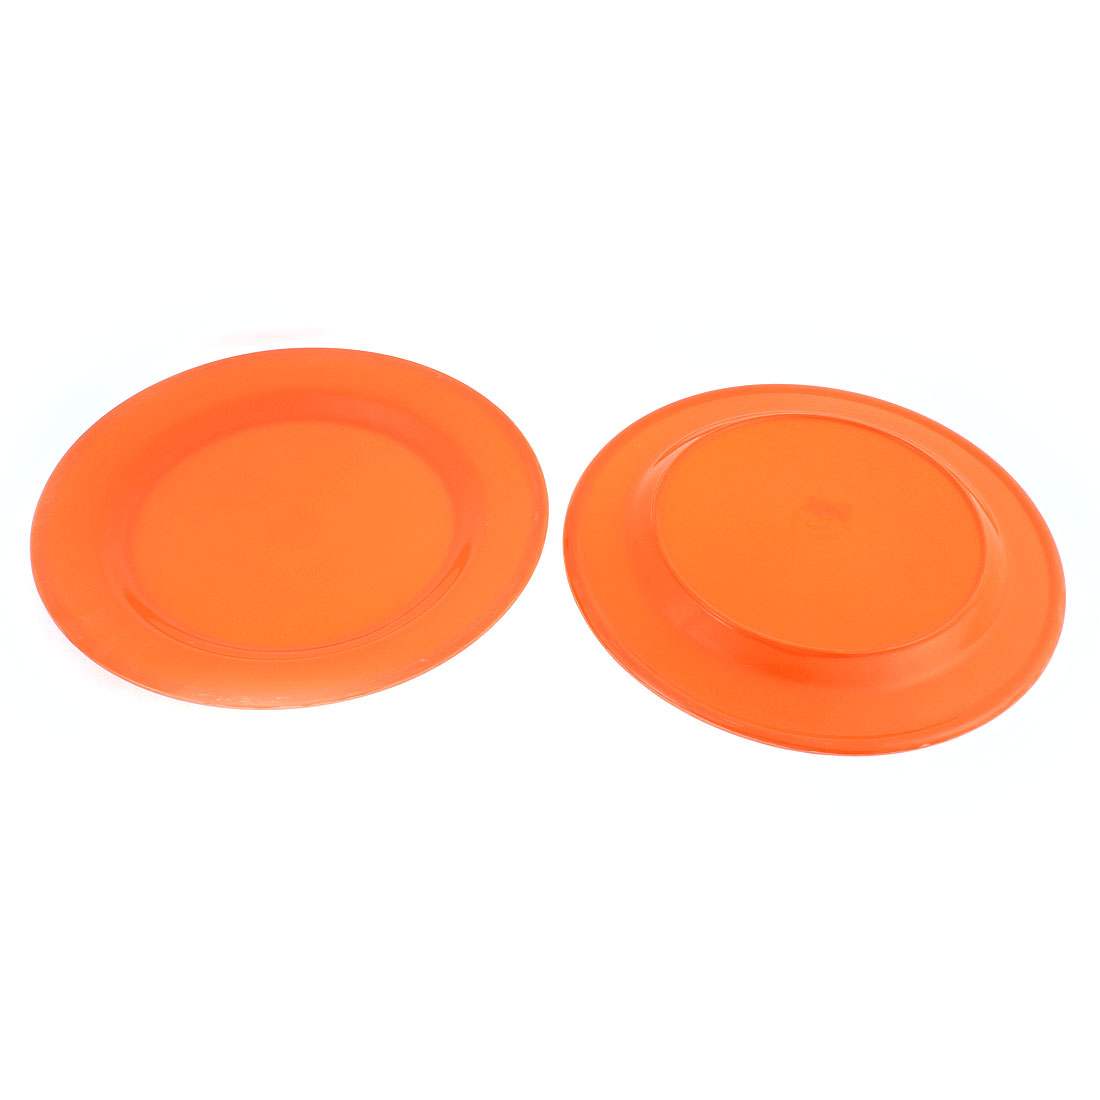 Kitchen Restaurant Plastic Round Shaped Food Dish Dessert Plate Tray Orange 2pcs